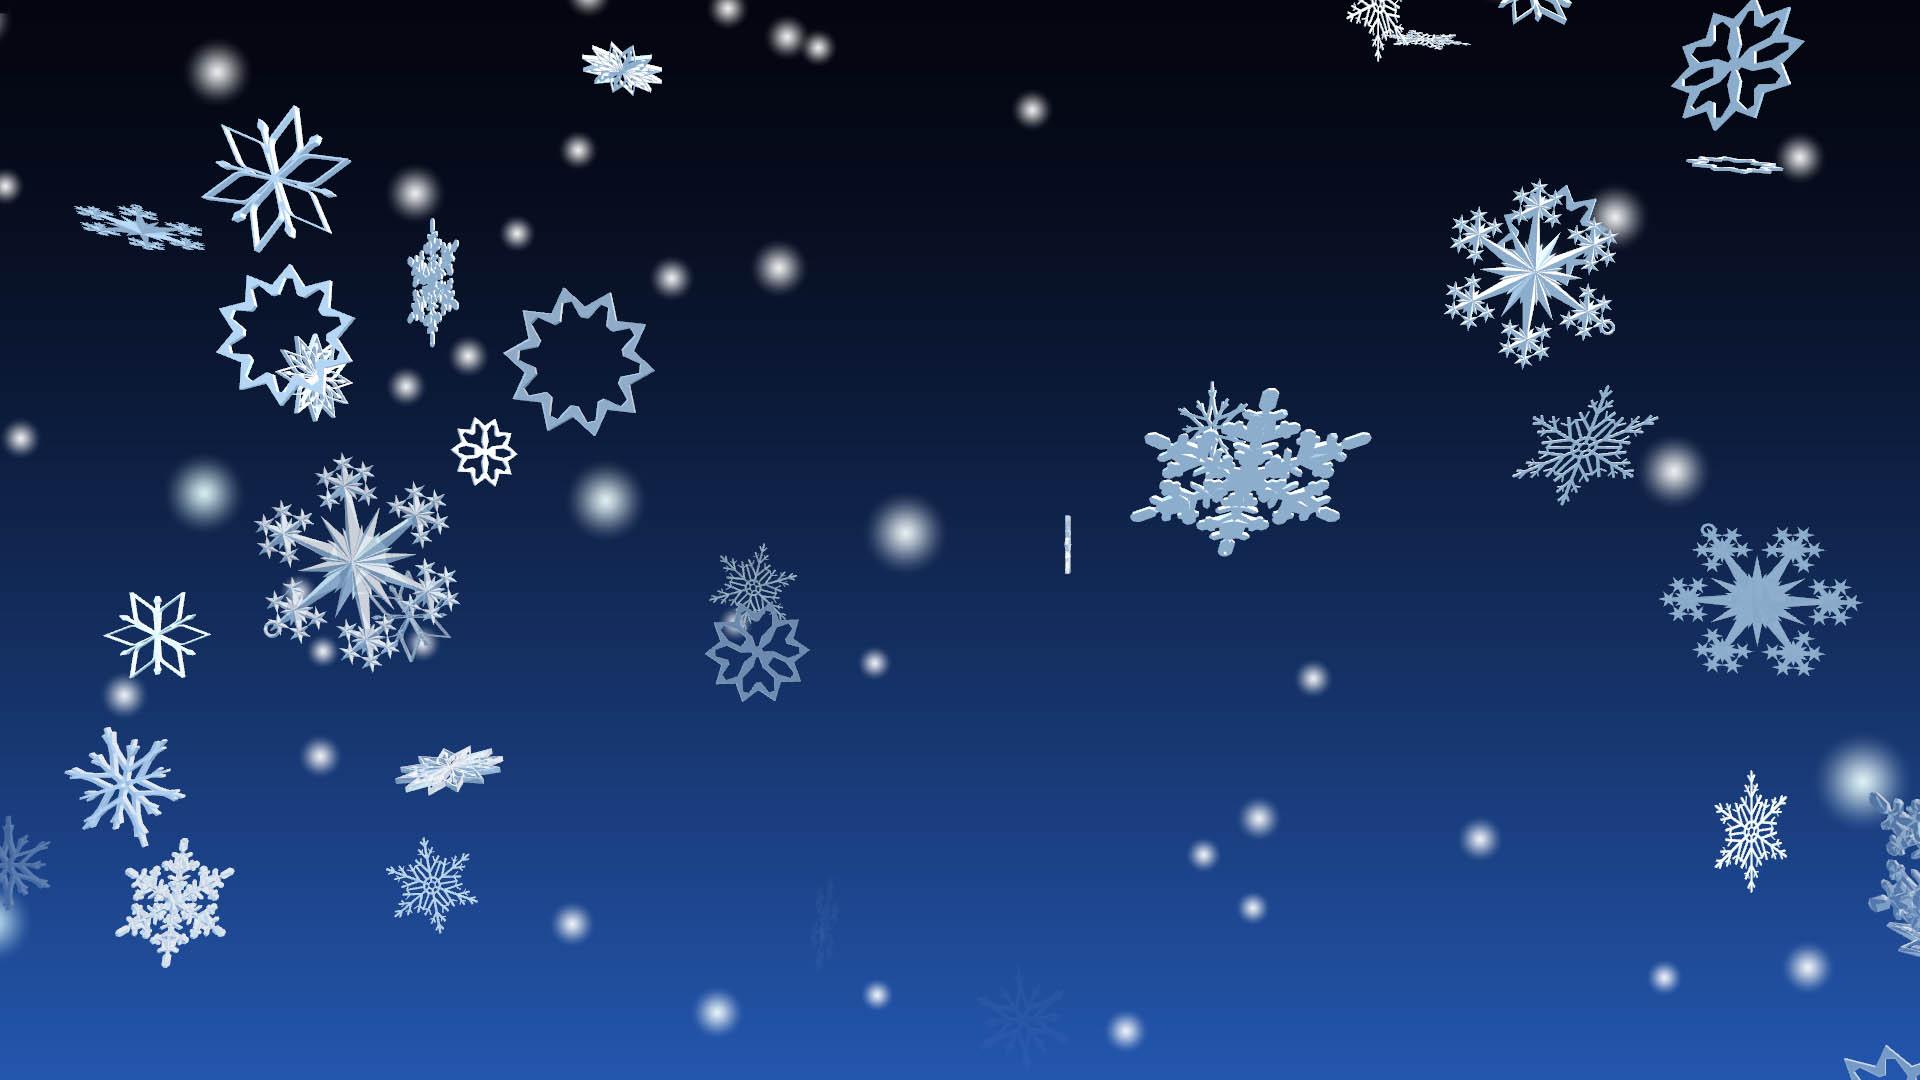 Free Animated Snow Fall Wallpaper Windows 10 3d Snowfall Screensaver 3d Winter Snowflakes